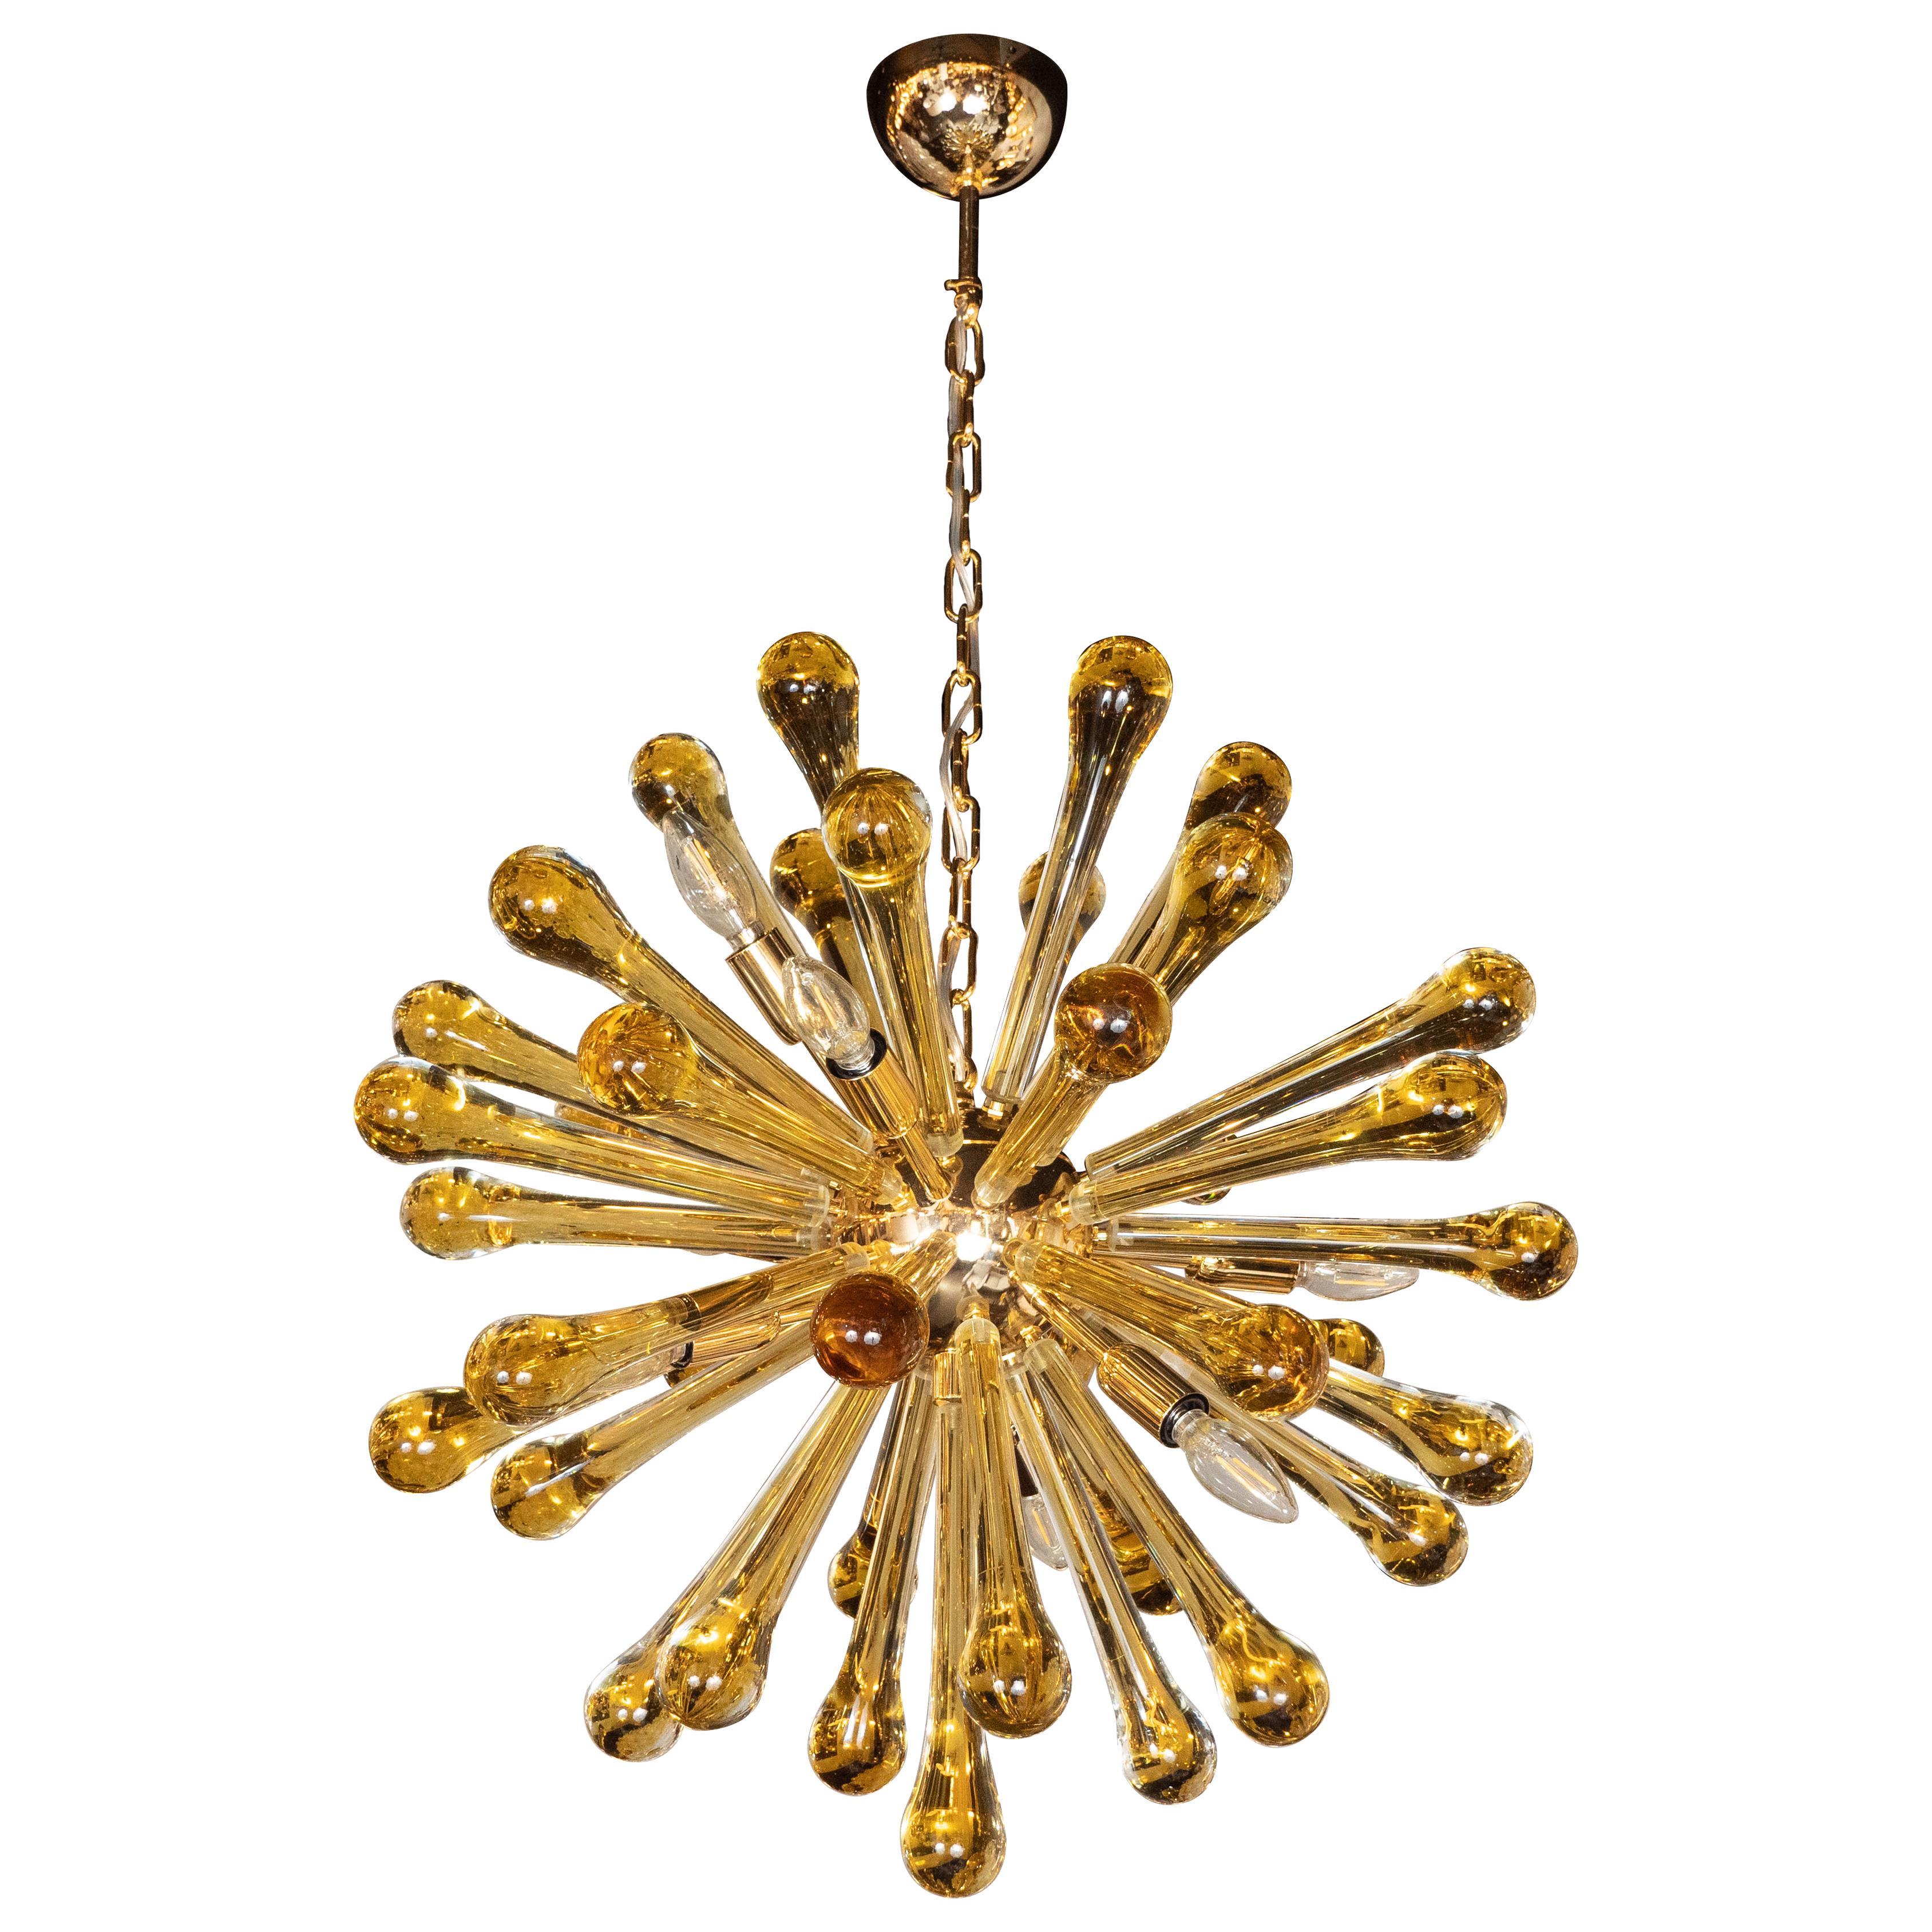 Modernist Handblown Murano Smoked Honey Glass Sputnik with Brass Fittings